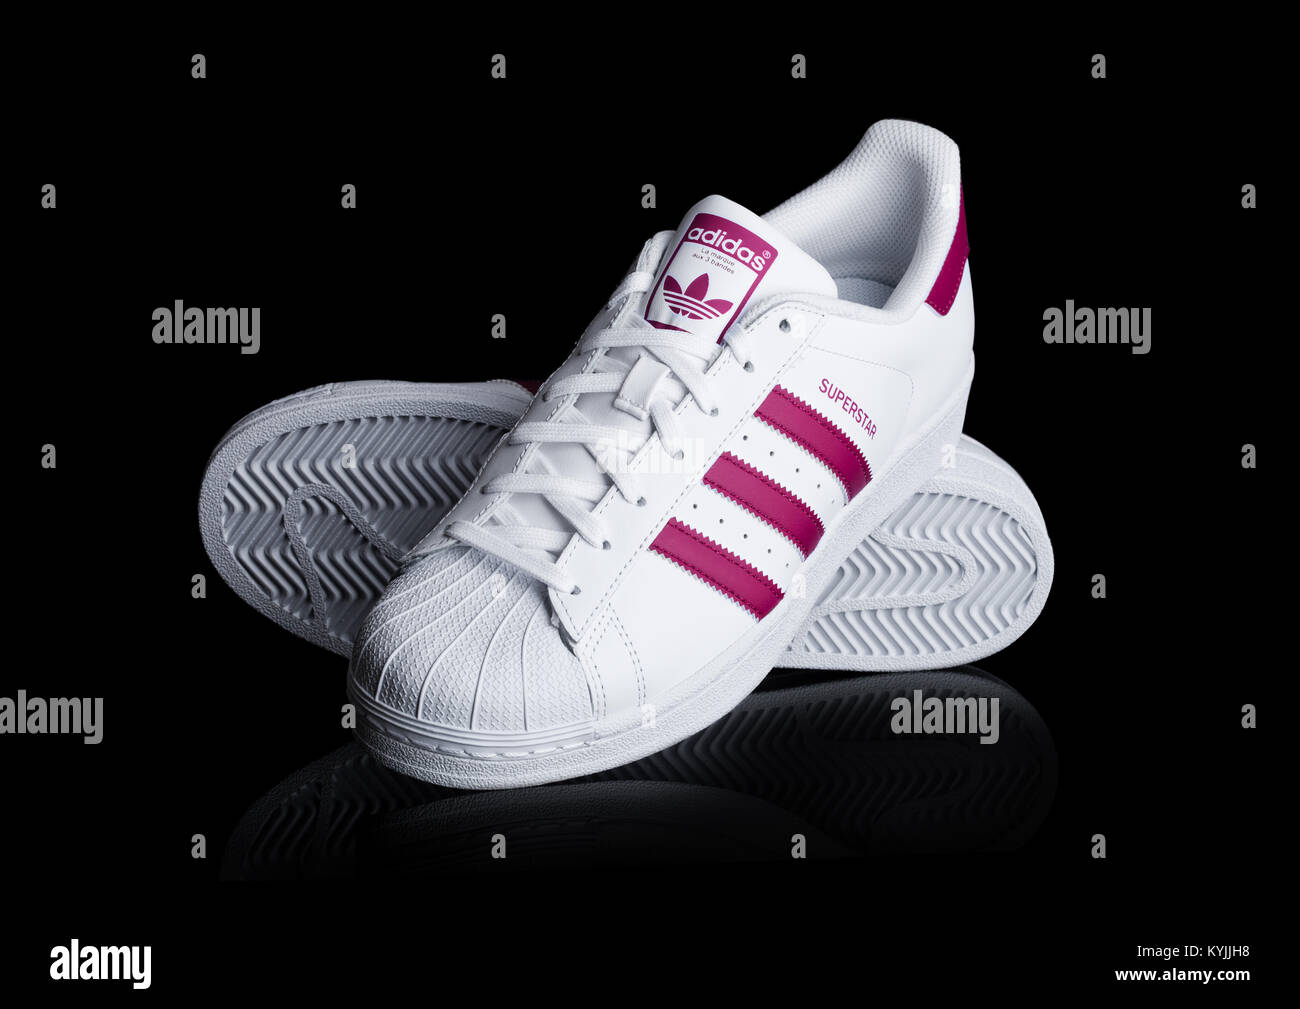 Rt Adidas Superstar Chaussures Superstar Adidas Rouge xtCdshQrB